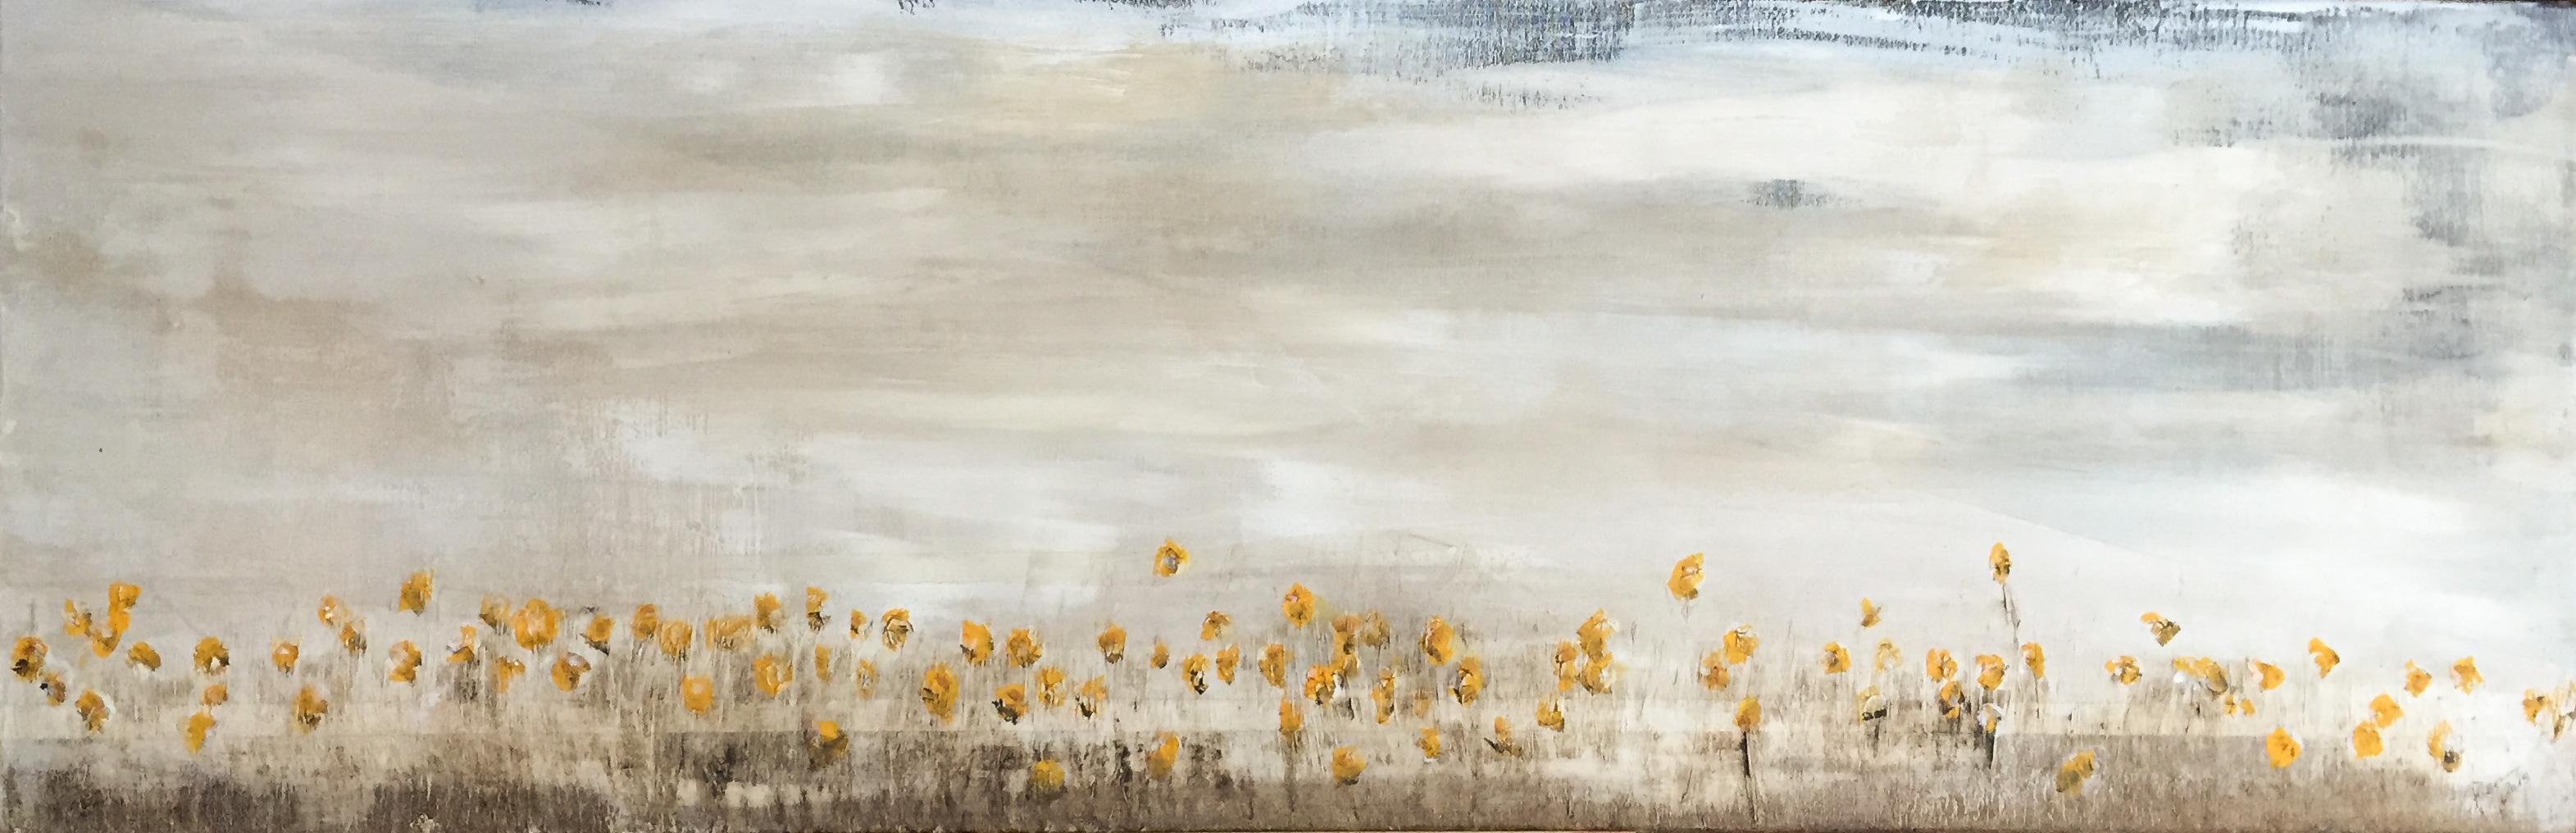 Sonnenblumenfeld_Sonja Riemer Art